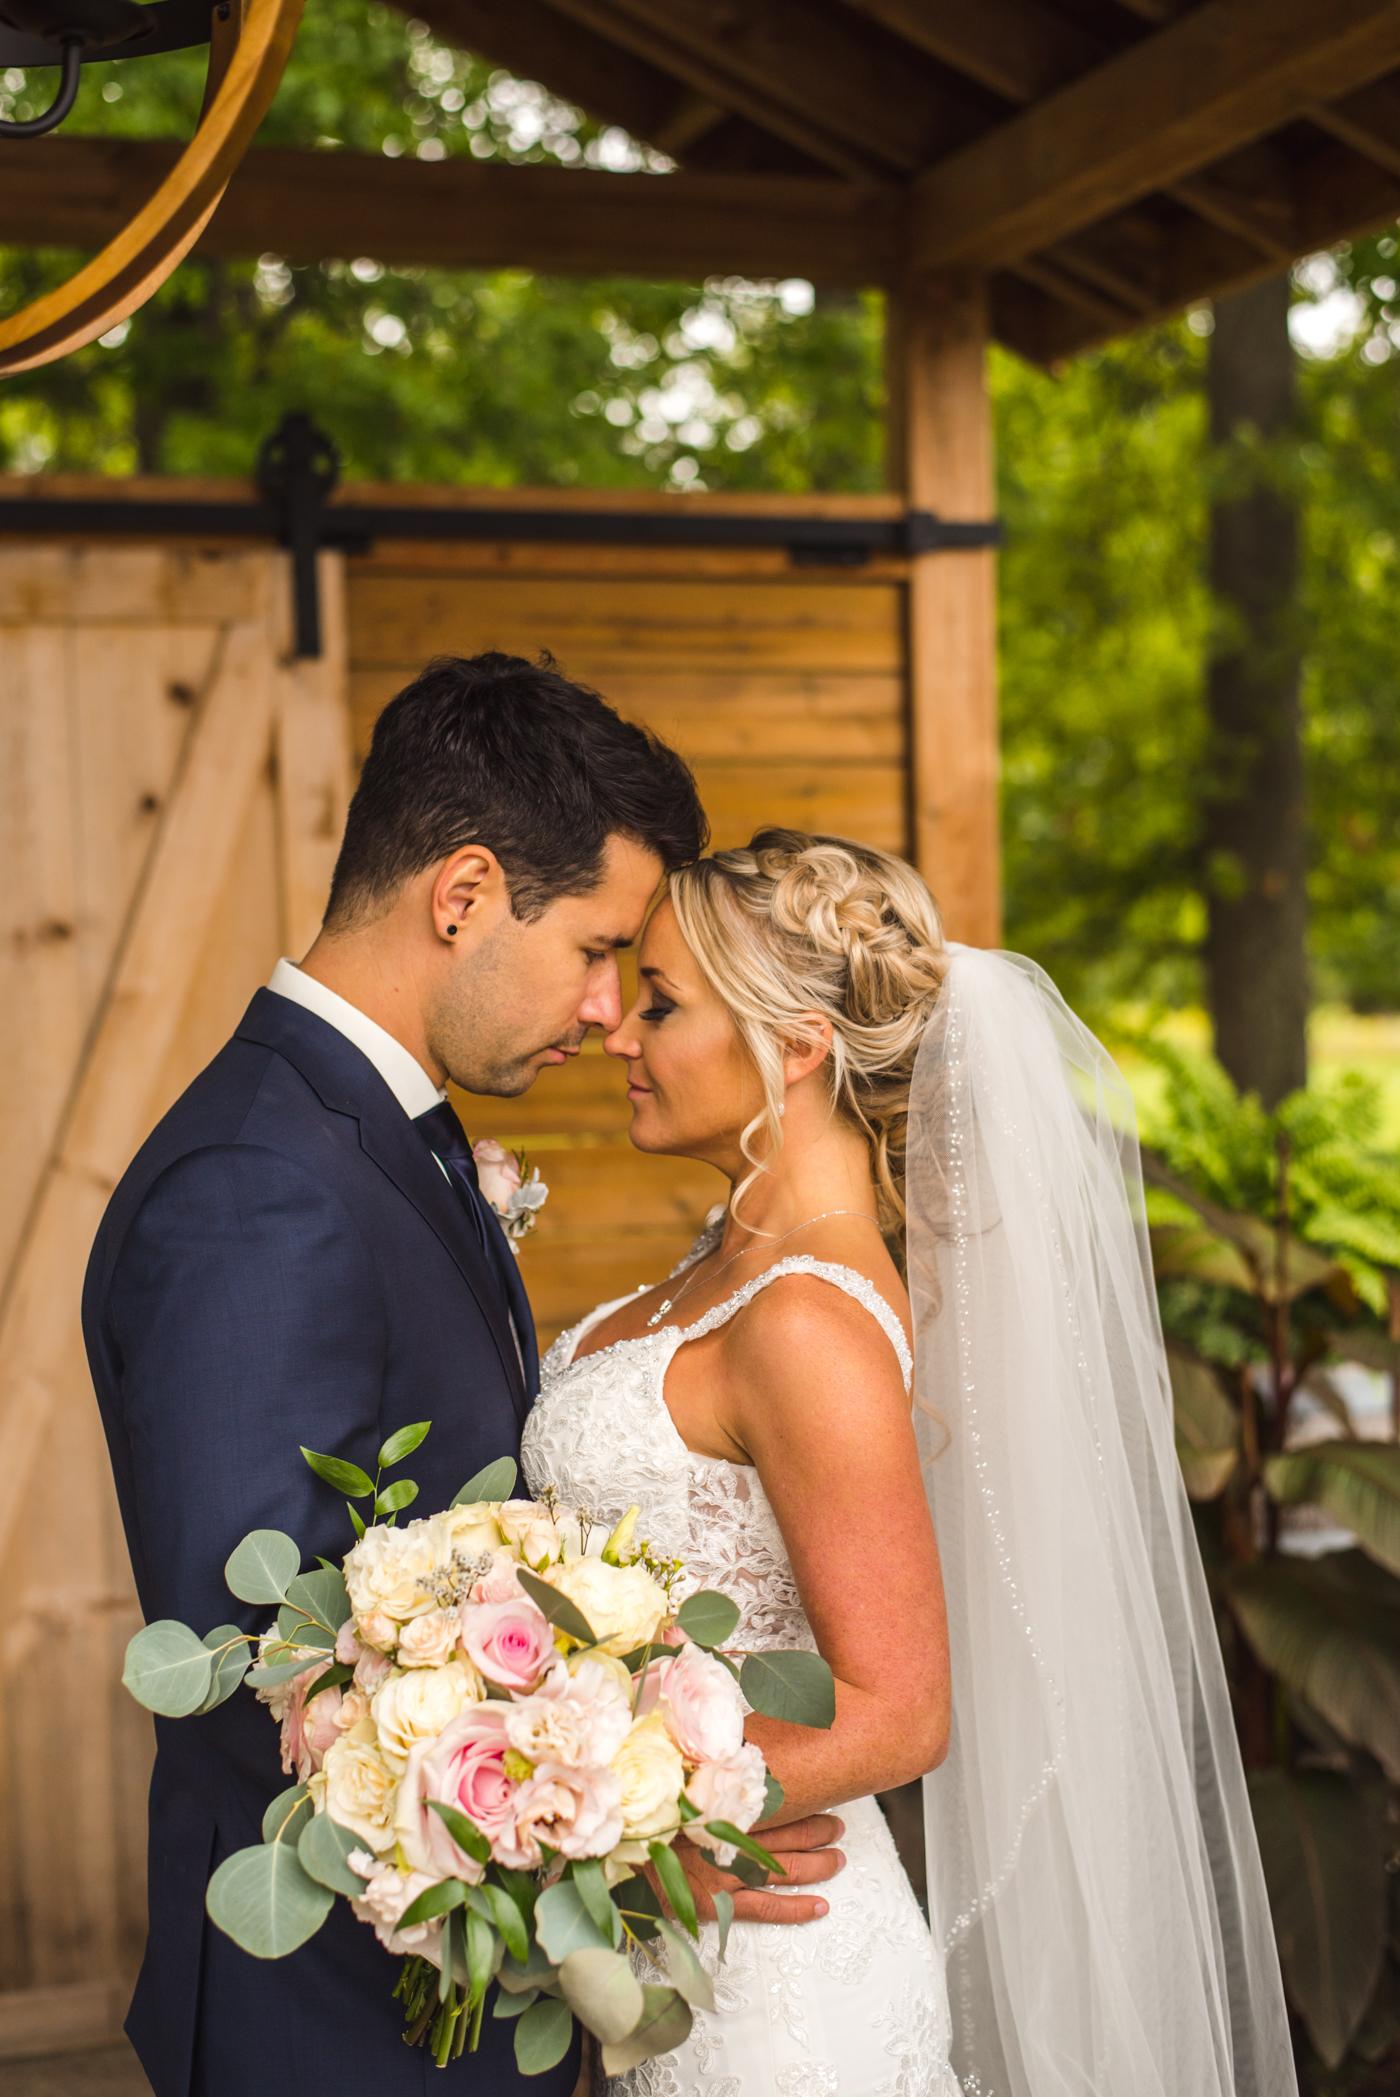 Eli & Michelle Wedding Hamilton St Catharines Niagara Ontario Club Roma Outdoor September Summer Aidan Hennebry of Hush Hush Photography & Film-16.jpg